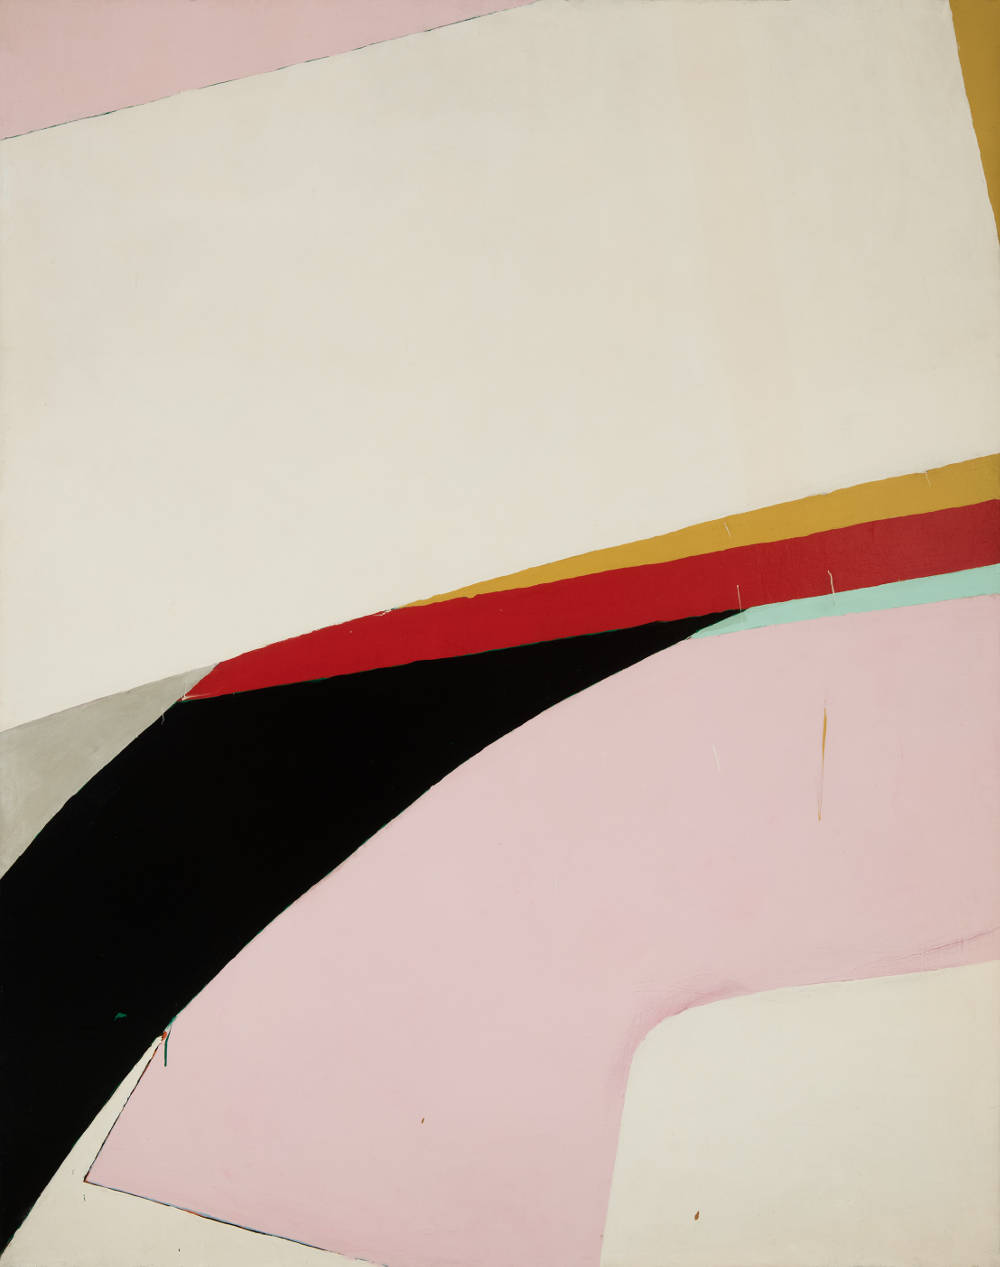 Knox Martin (b. 1923), Polar Mill, 1966. Magna acrylic on canvas 101 x 80 inches